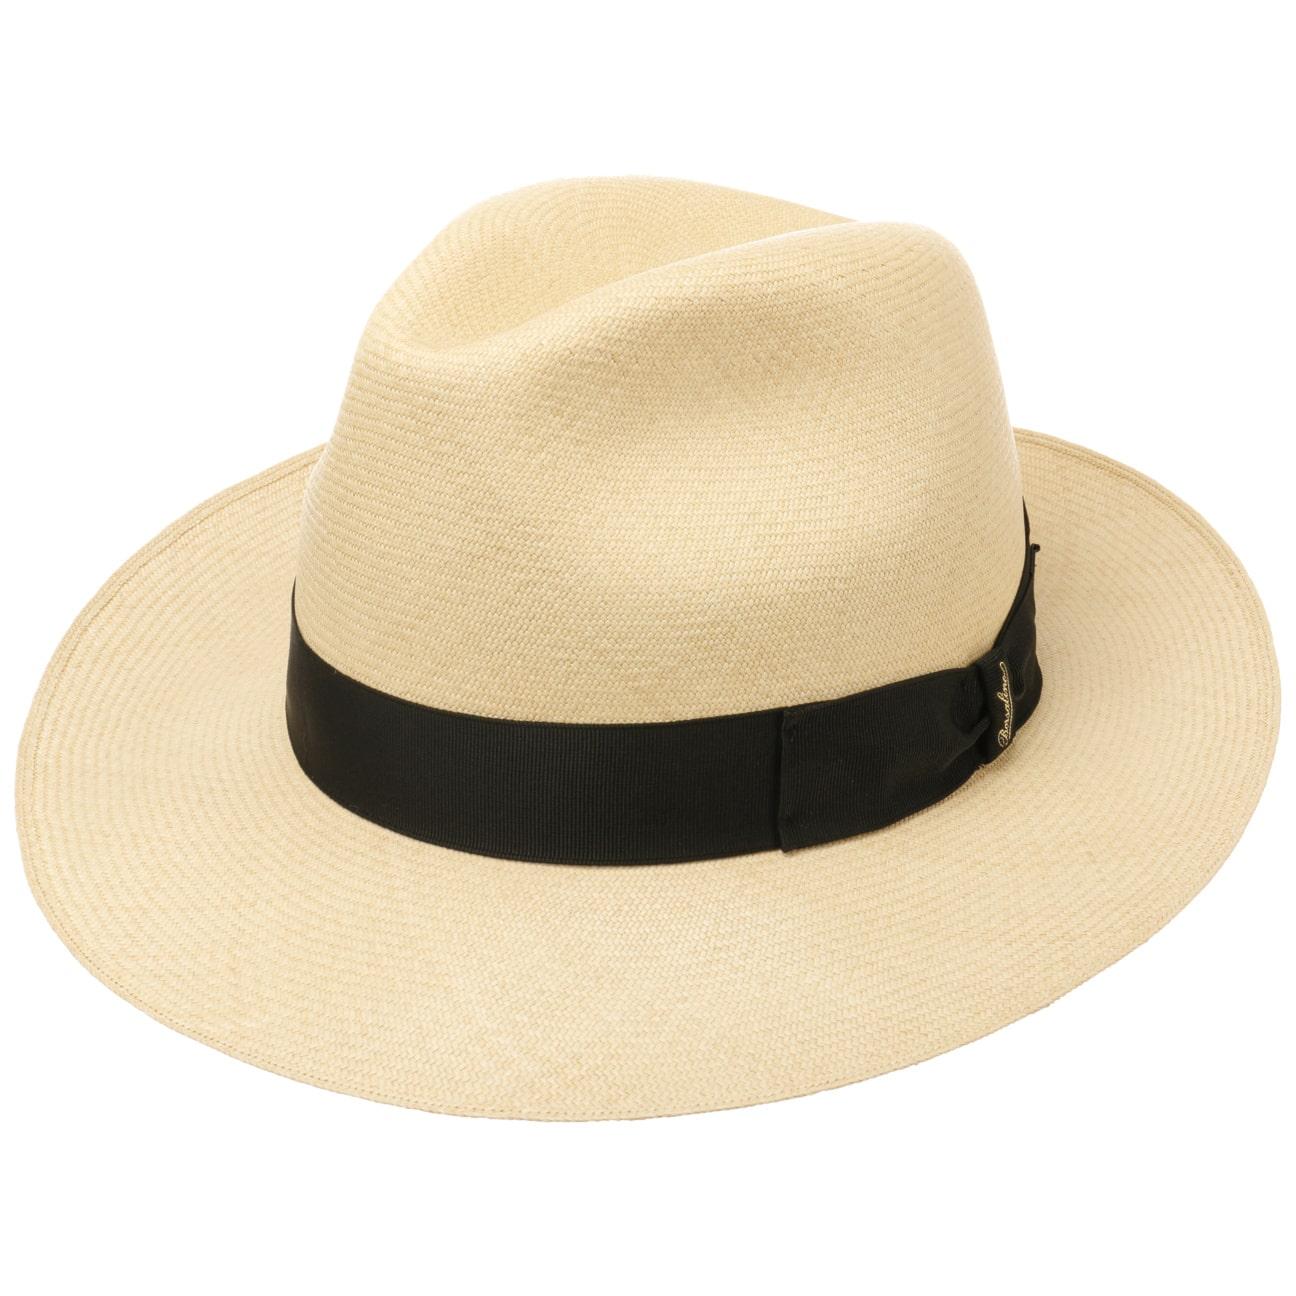 Sombrero Bogart Panam? Borsalino Premium  sombrero de sol